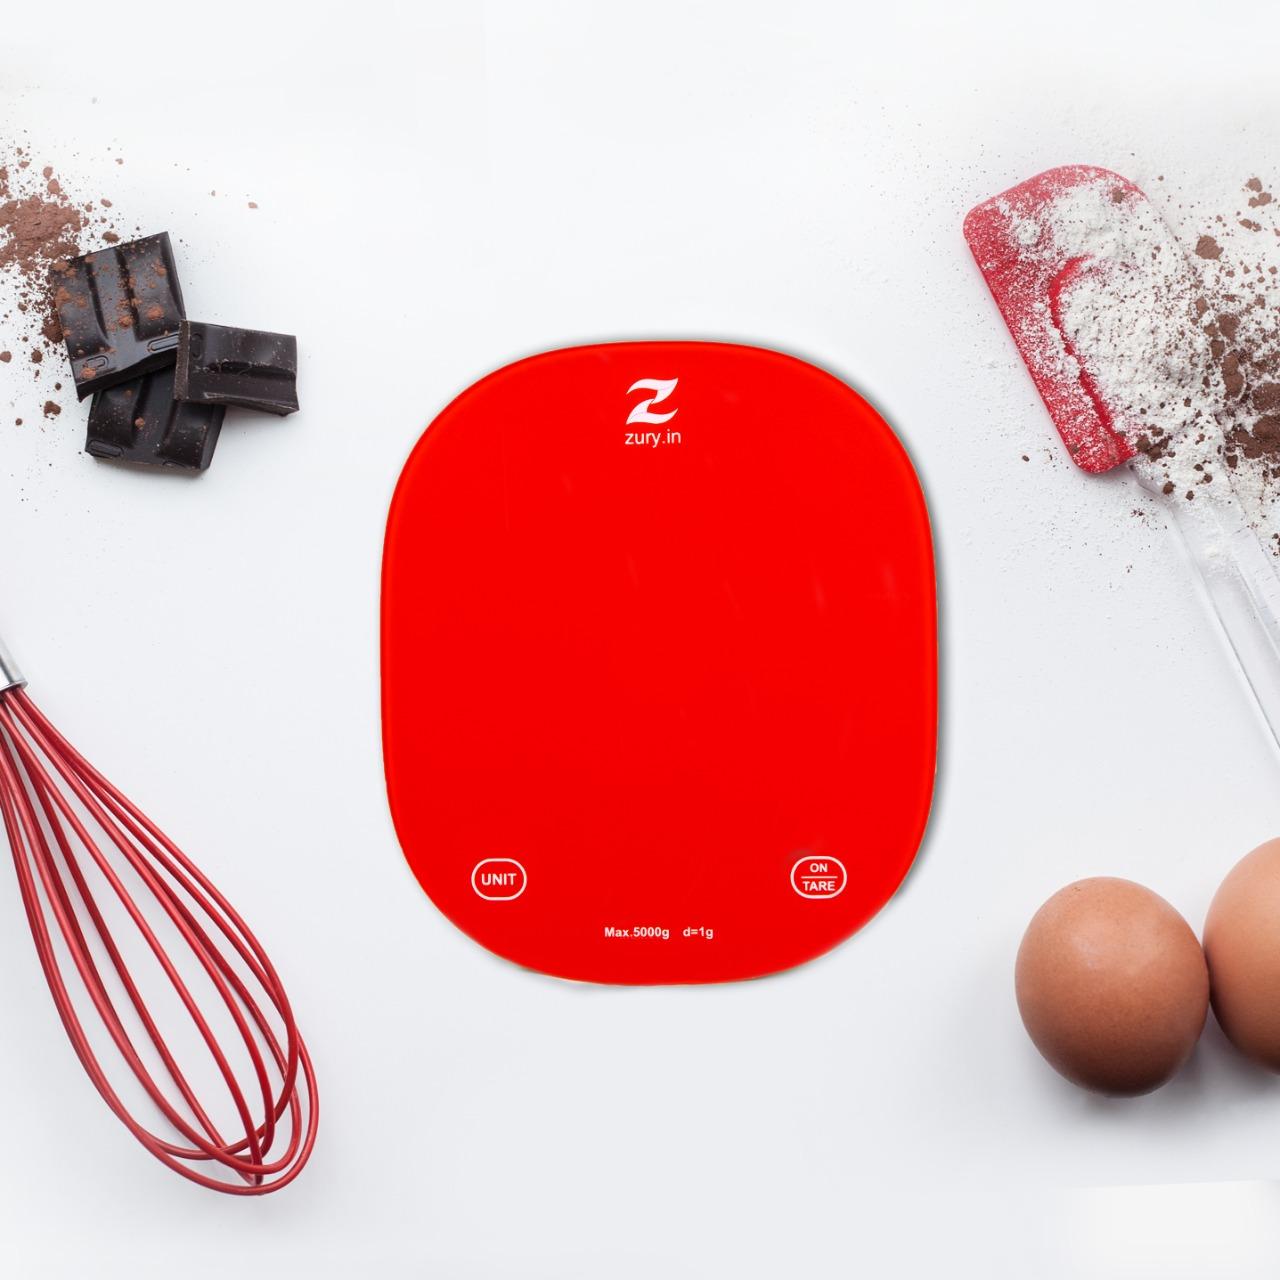 zury-product-item